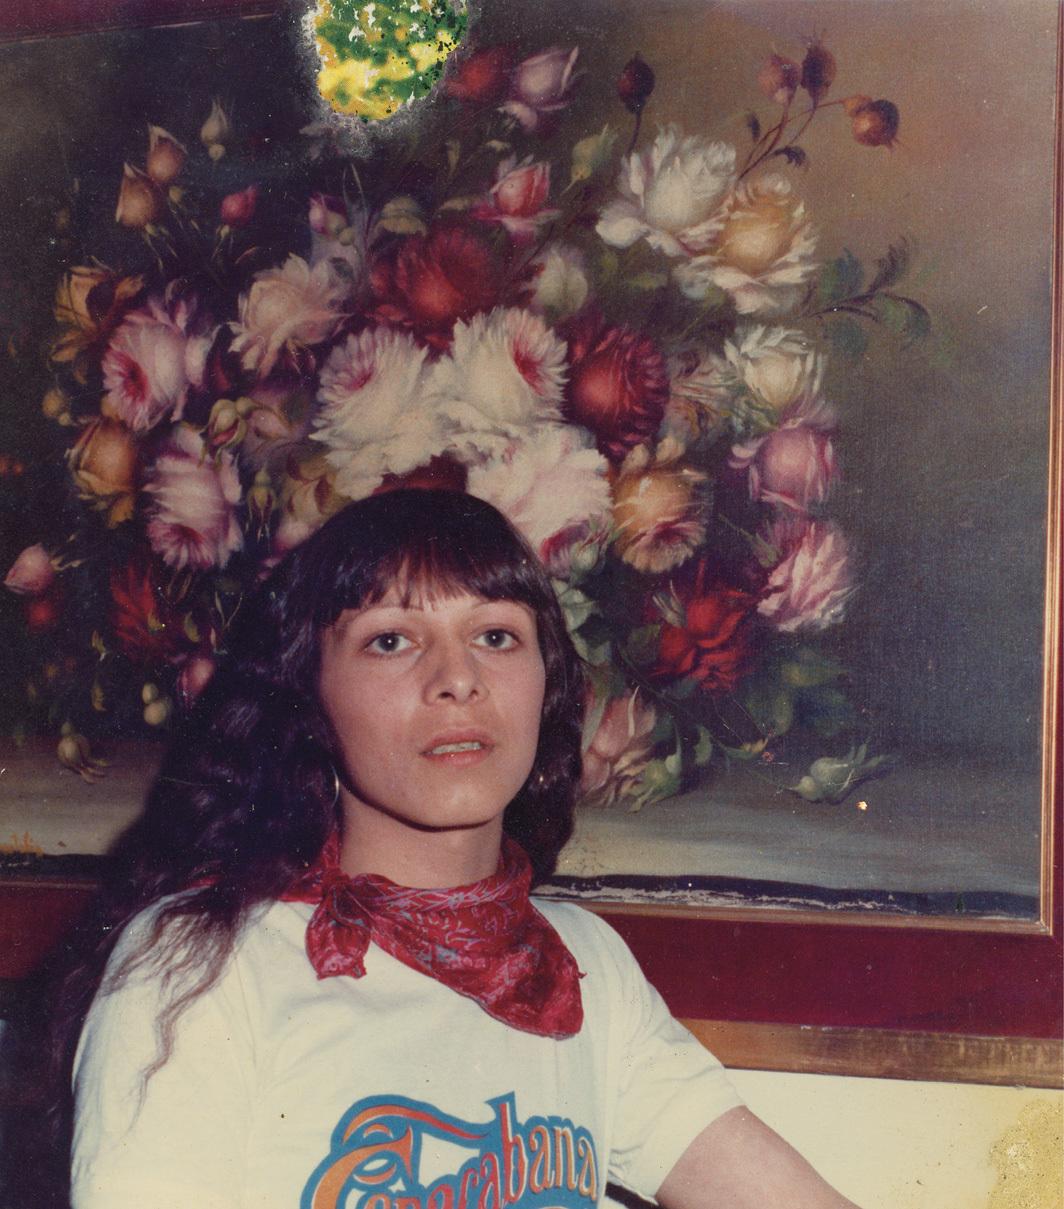 Julieta Gonzalez, Tigre, Buenos Aires, 1985.